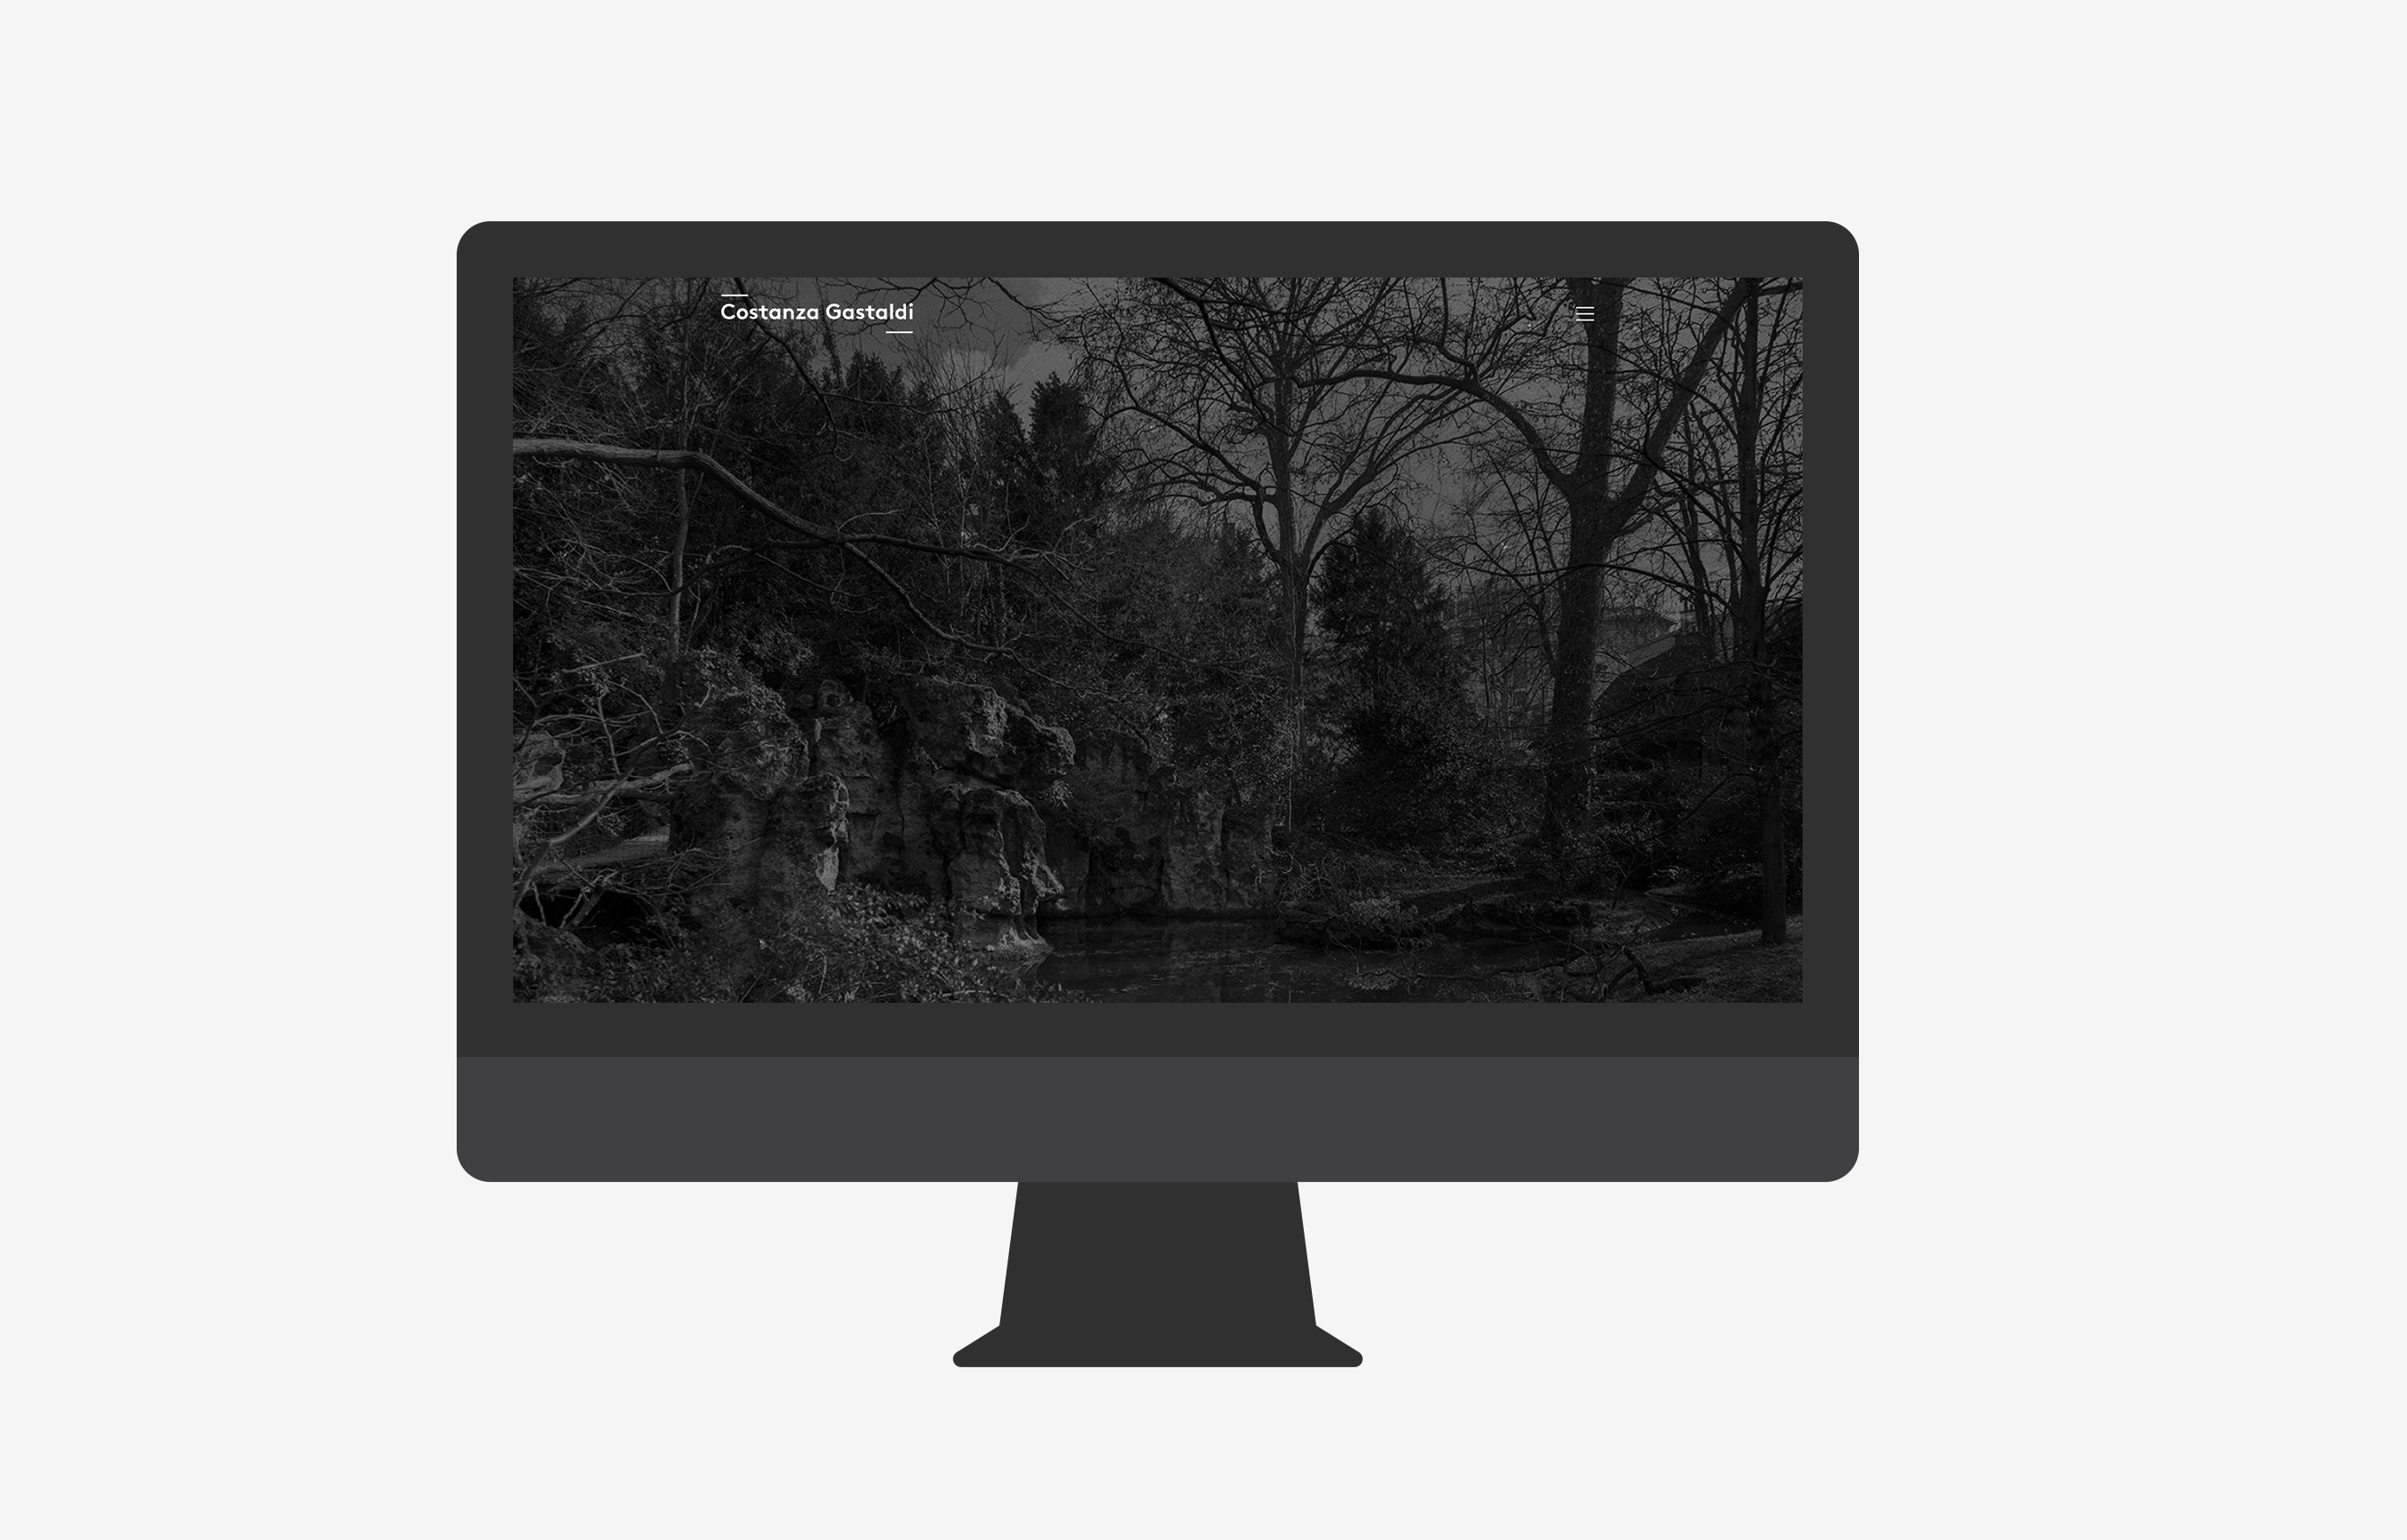 02-costanza-gastaldi-pikteo-webdesign-graphic-design-freelance-paris-bruxelles-londres